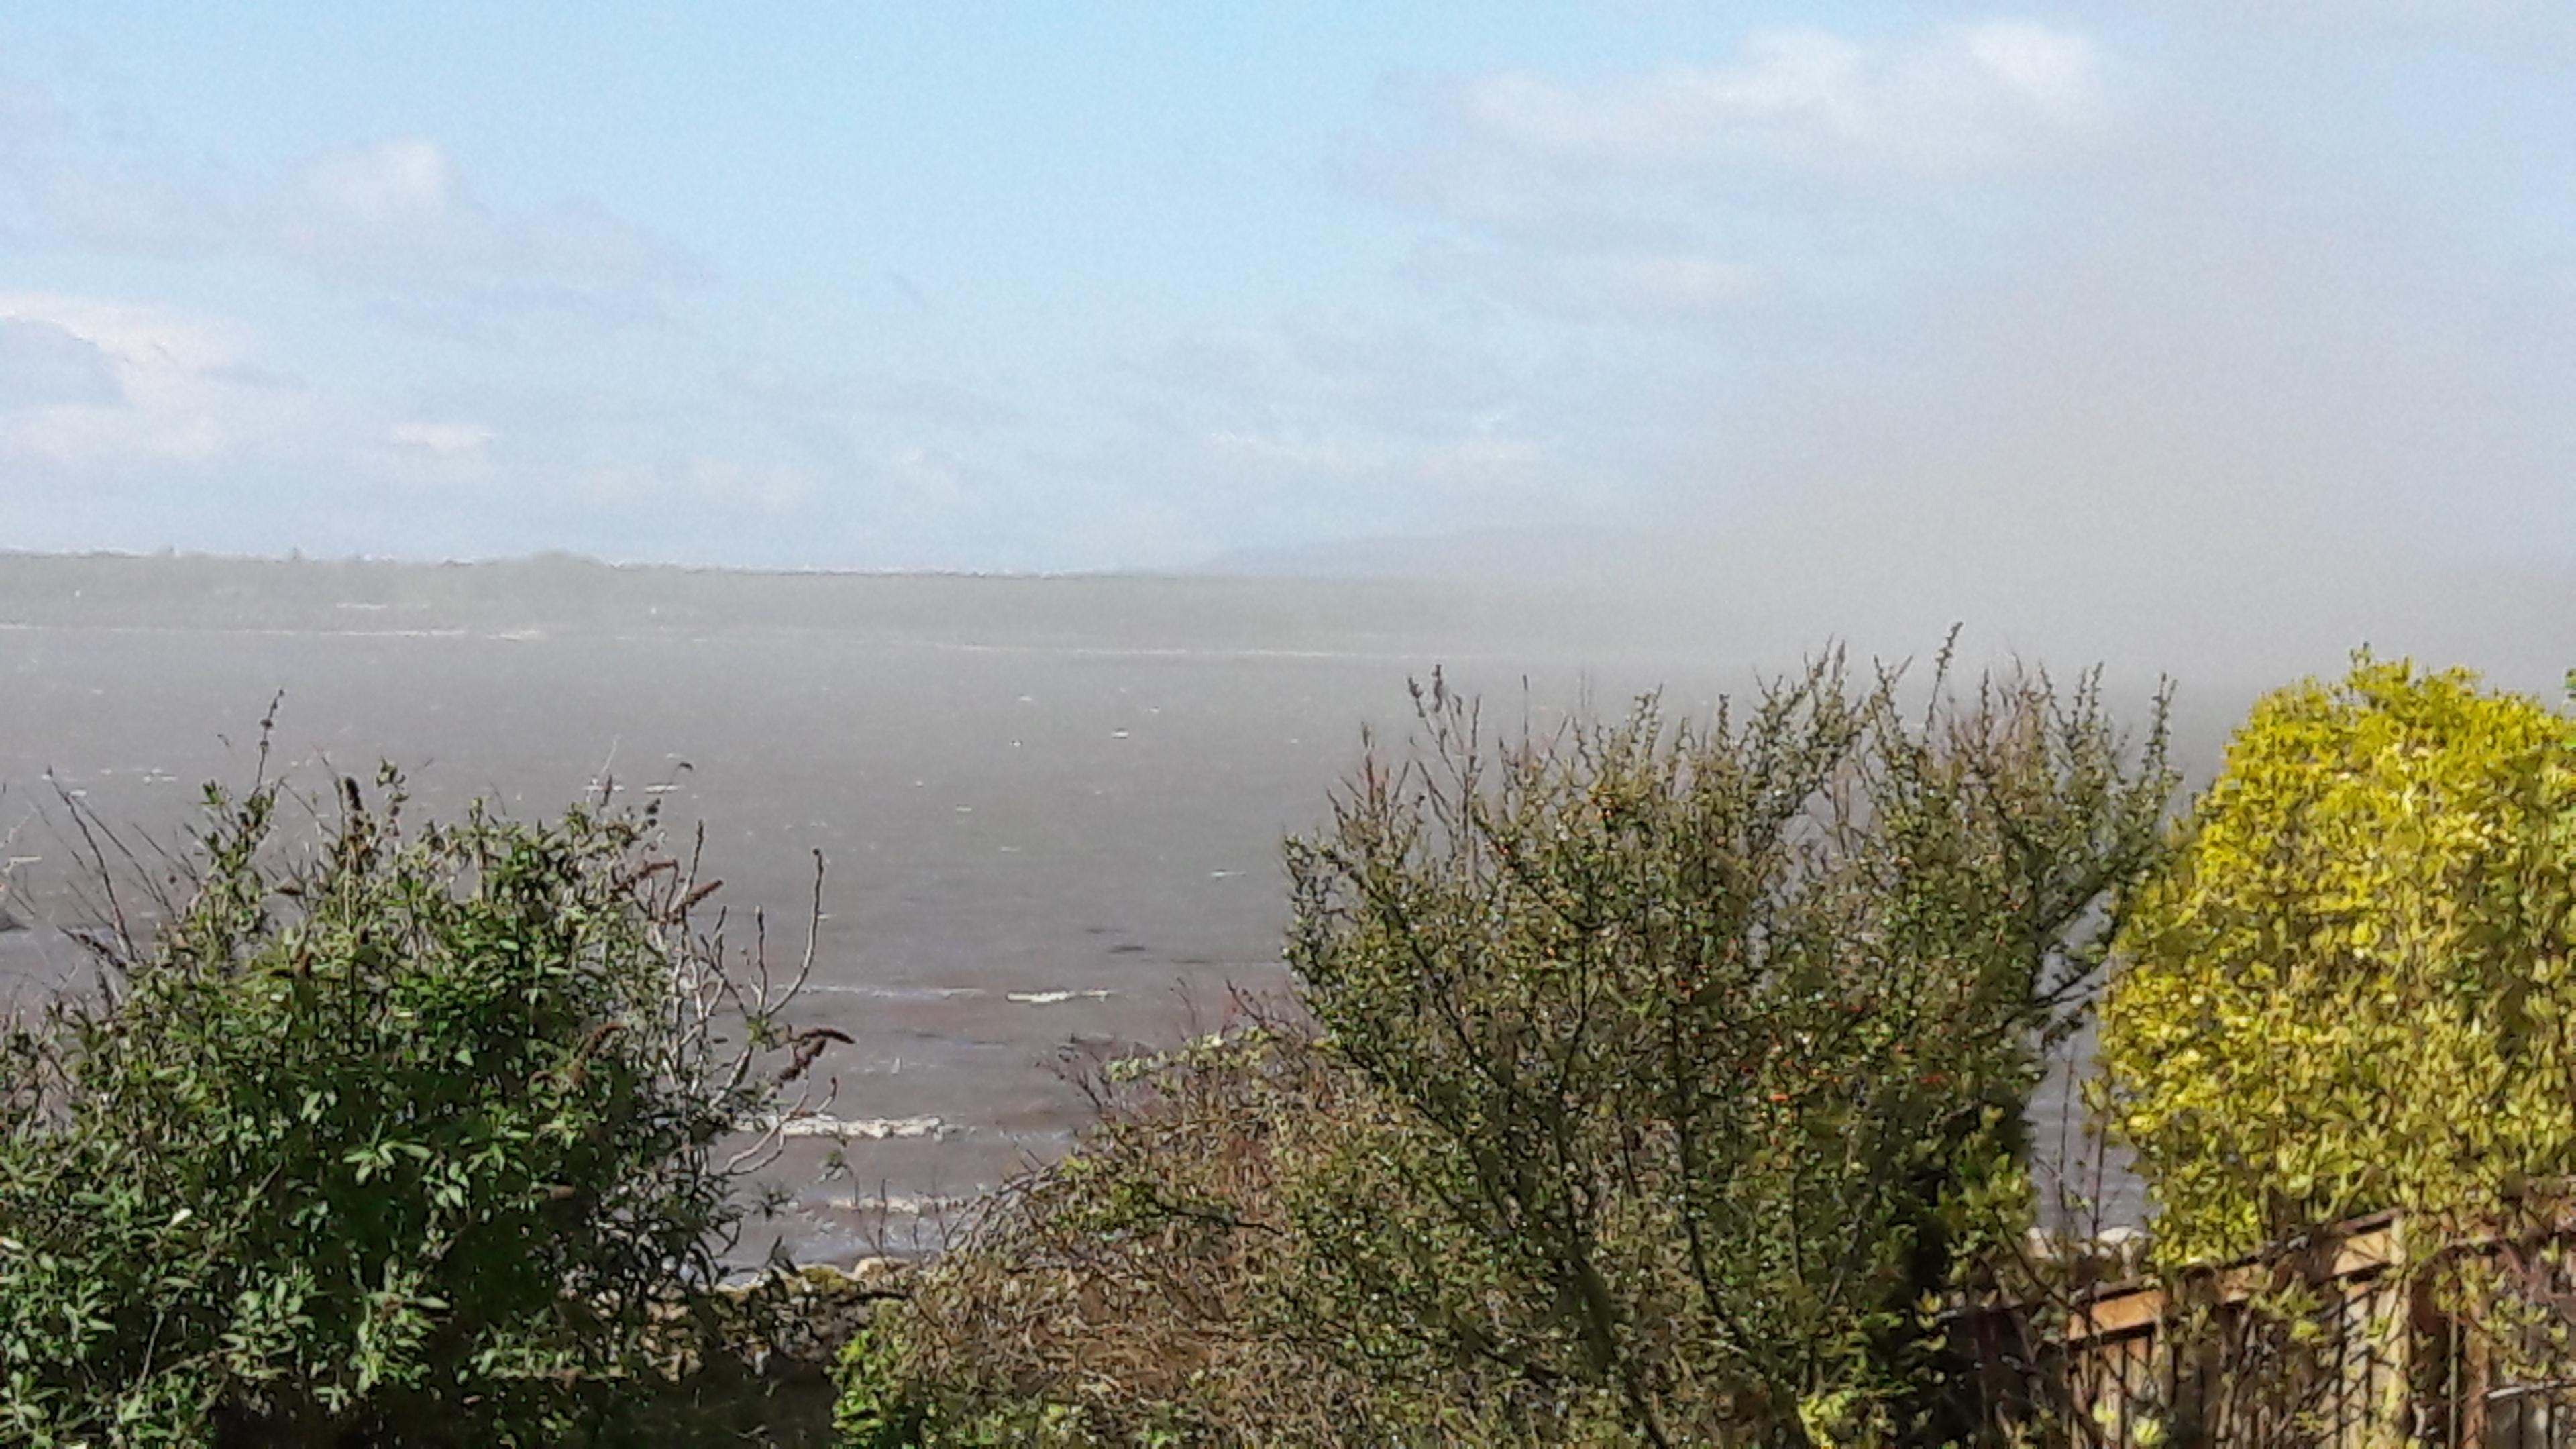 The ash cloud over the Fife coast.